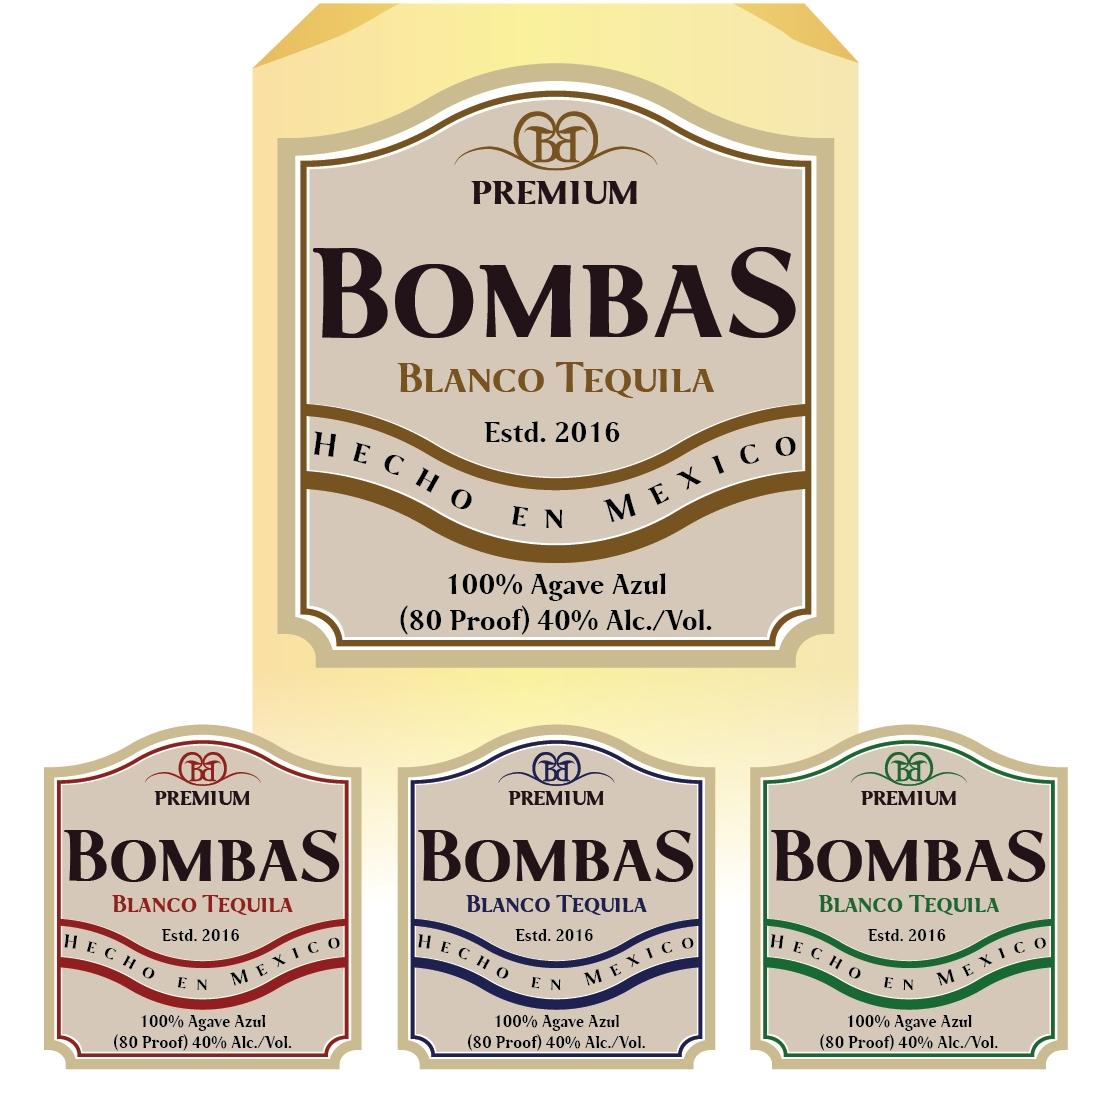 Bombas Tequila label designs